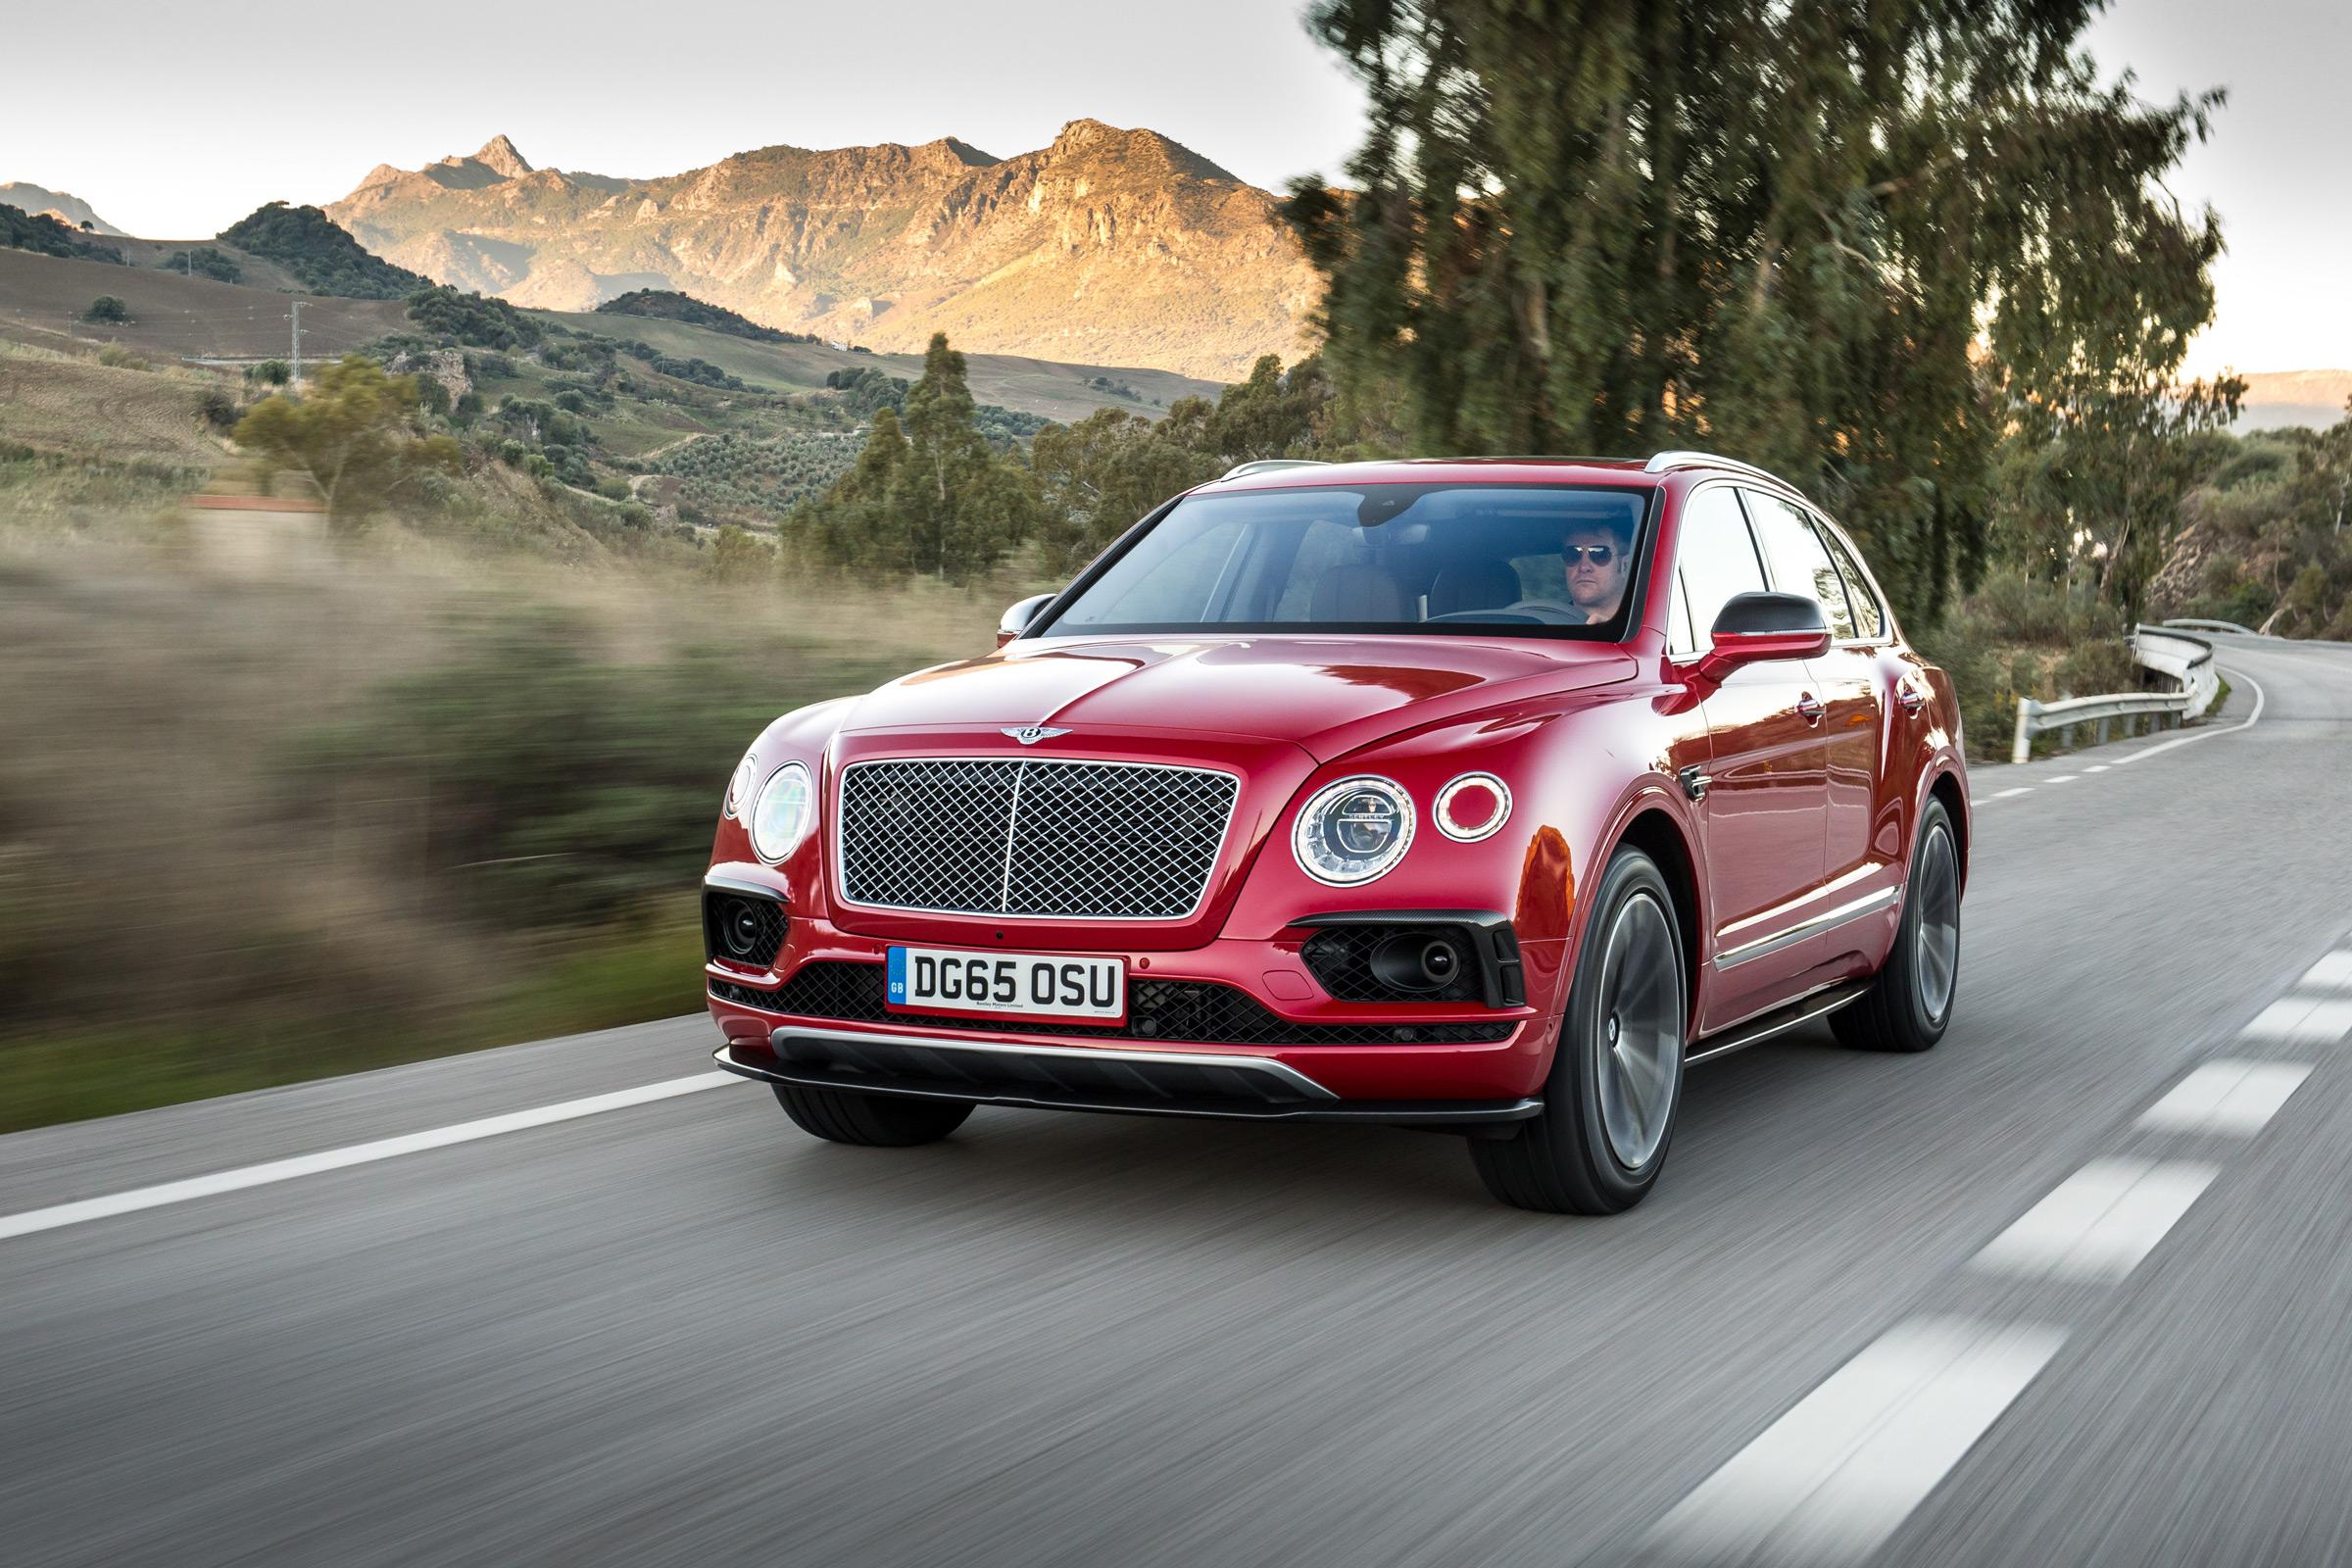 Bentley Bentayga Review Interior Design And Technology Auto Express